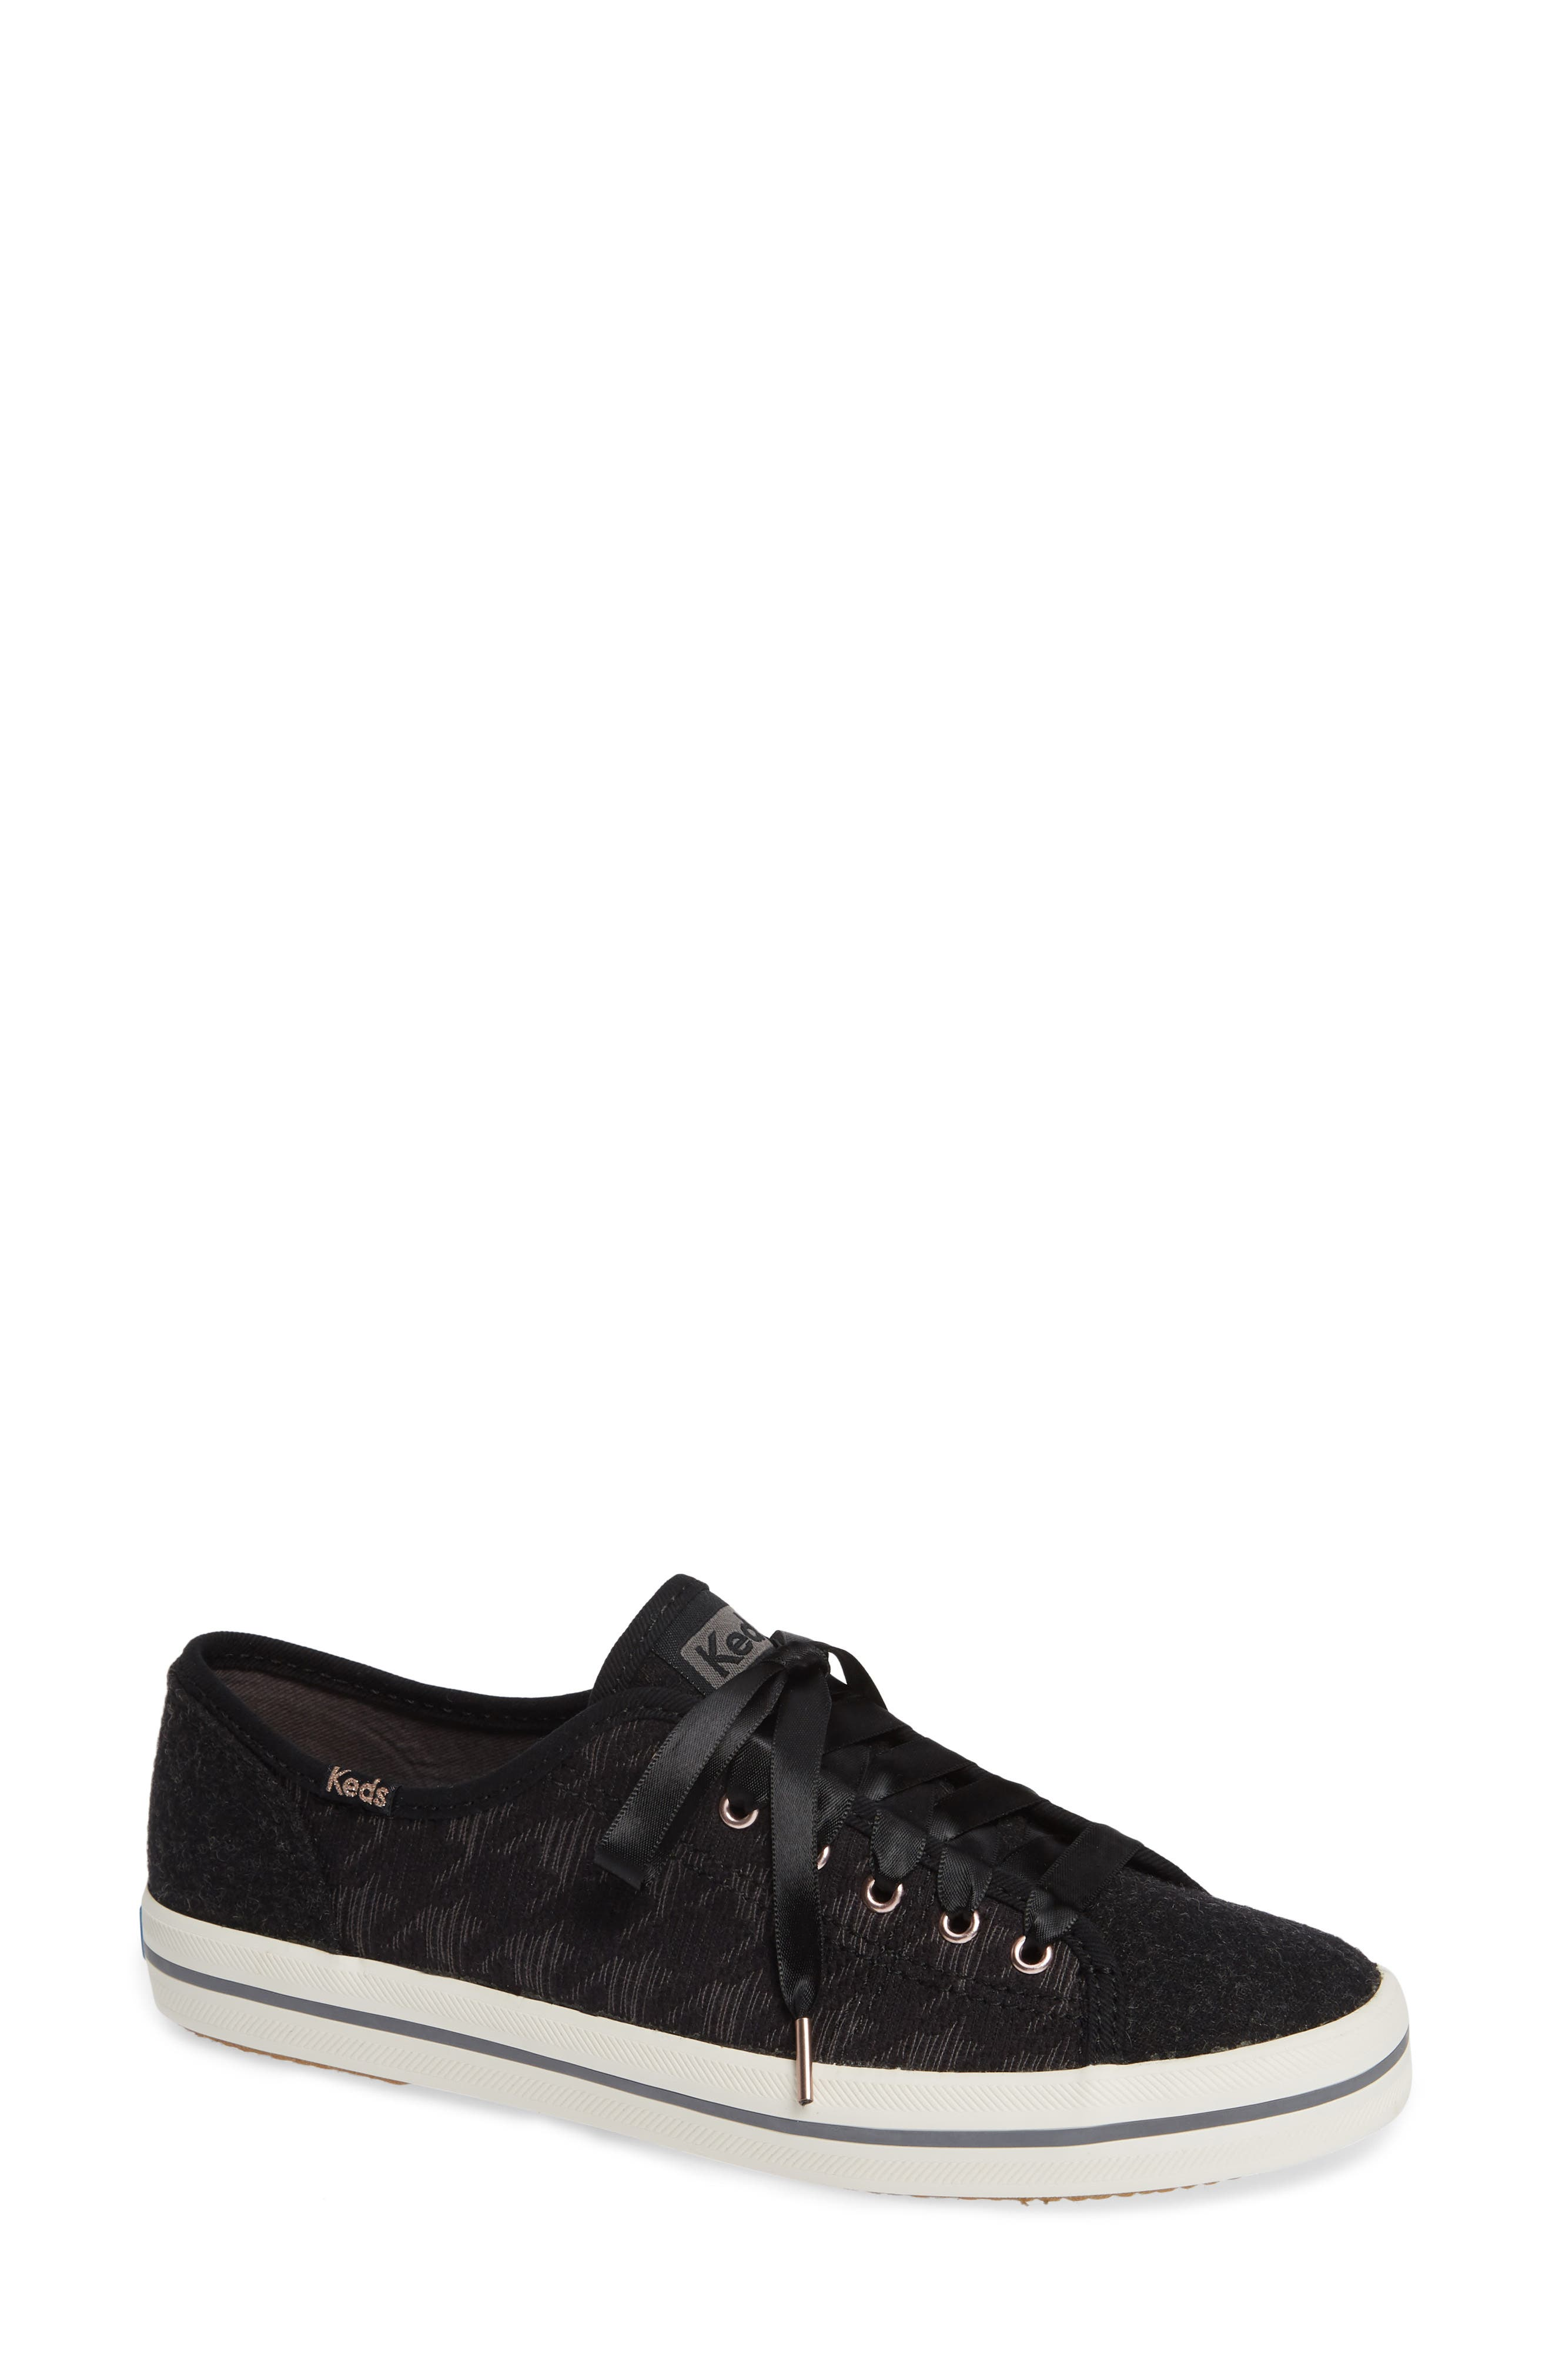 KEDS<SUP>®</SUP>, Kickstart Sneaker, Main thumbnail 1, color, BLACK HOUNDSTOOTH